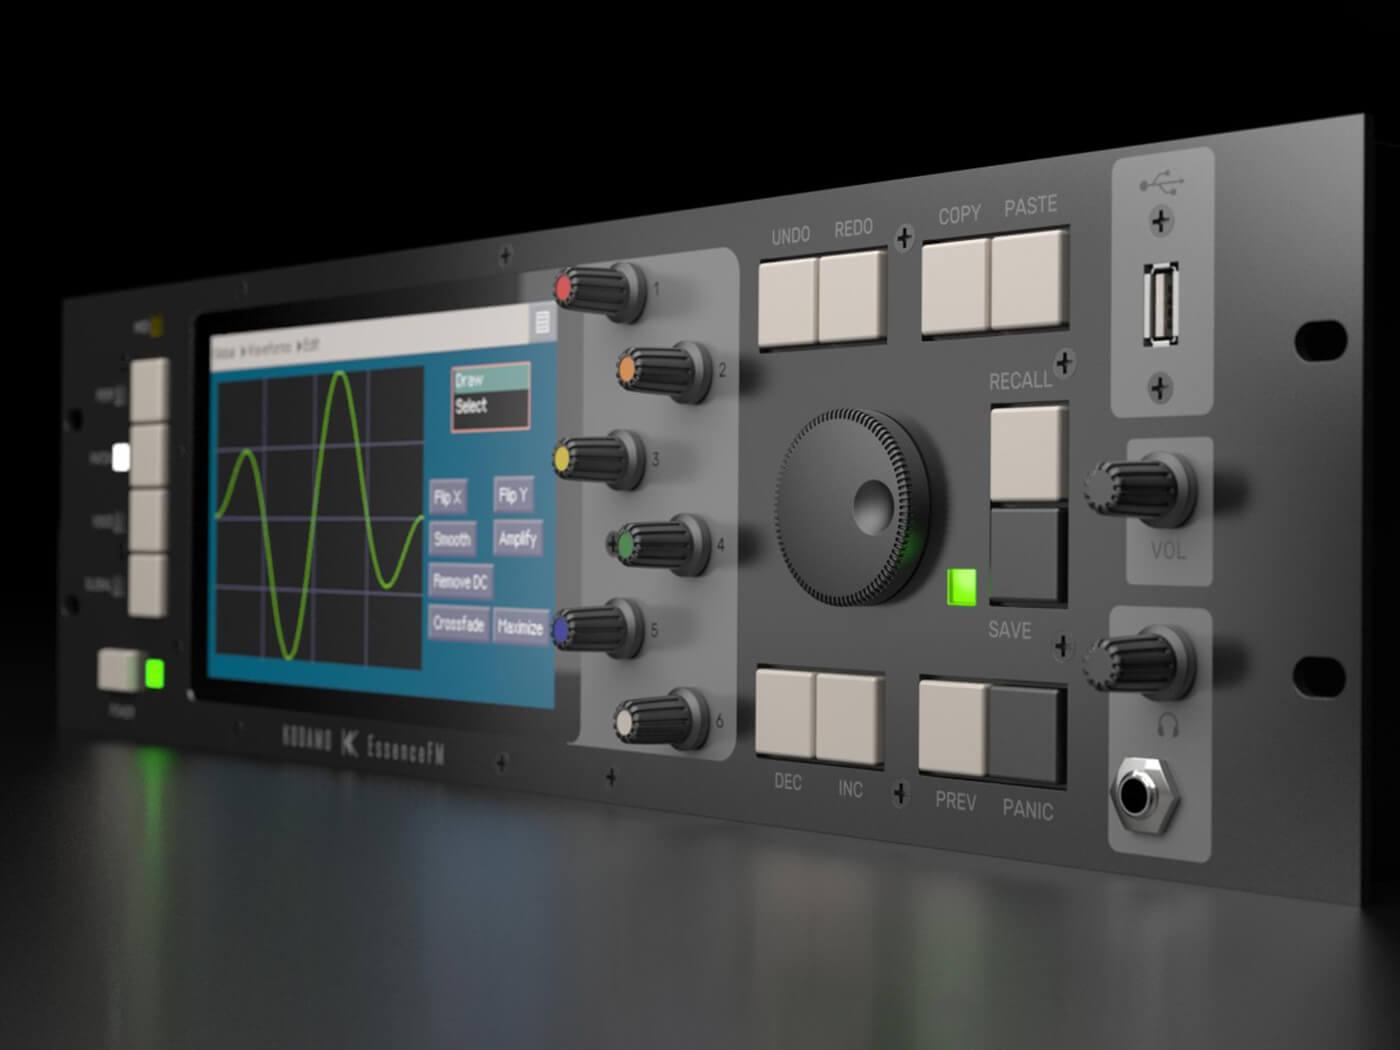 Kodamo's futuristic EssenceFM synth takes a graphical approach